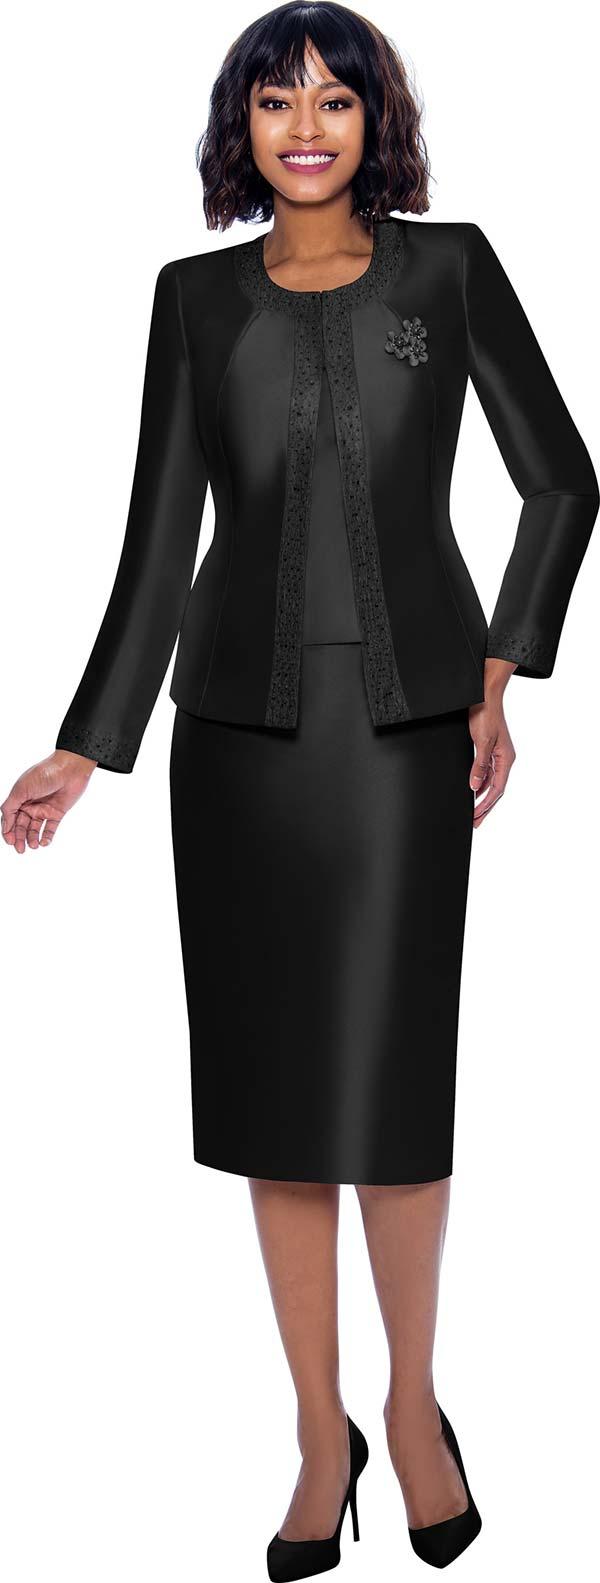 Terramina 7637-Black - Church Suit With Embellished Trim On Jacket